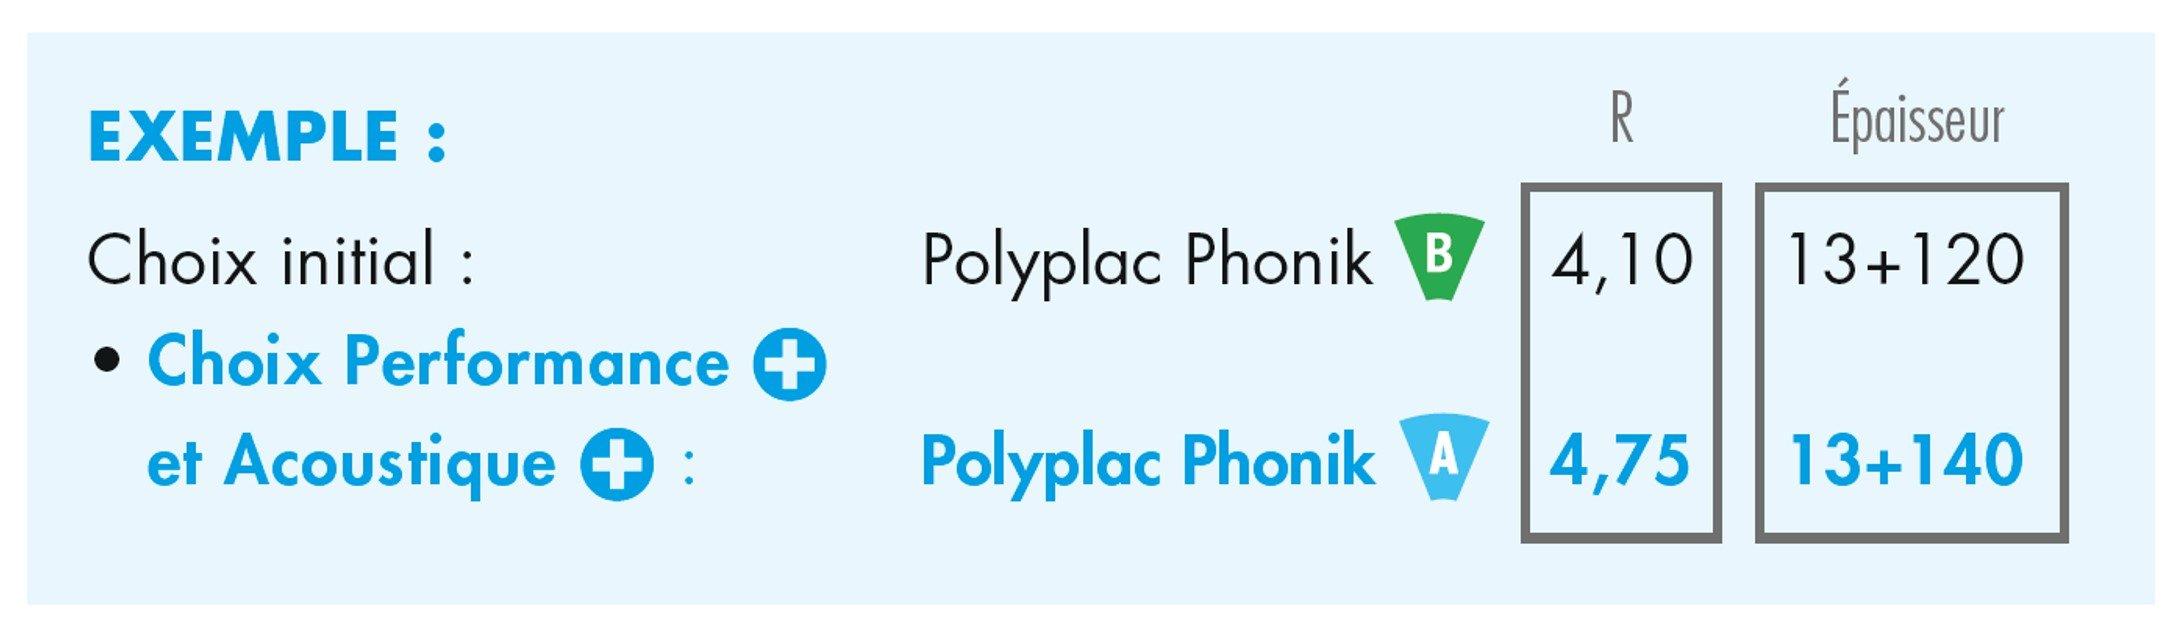 knauf_polyplac_phonik_classe supérieur1